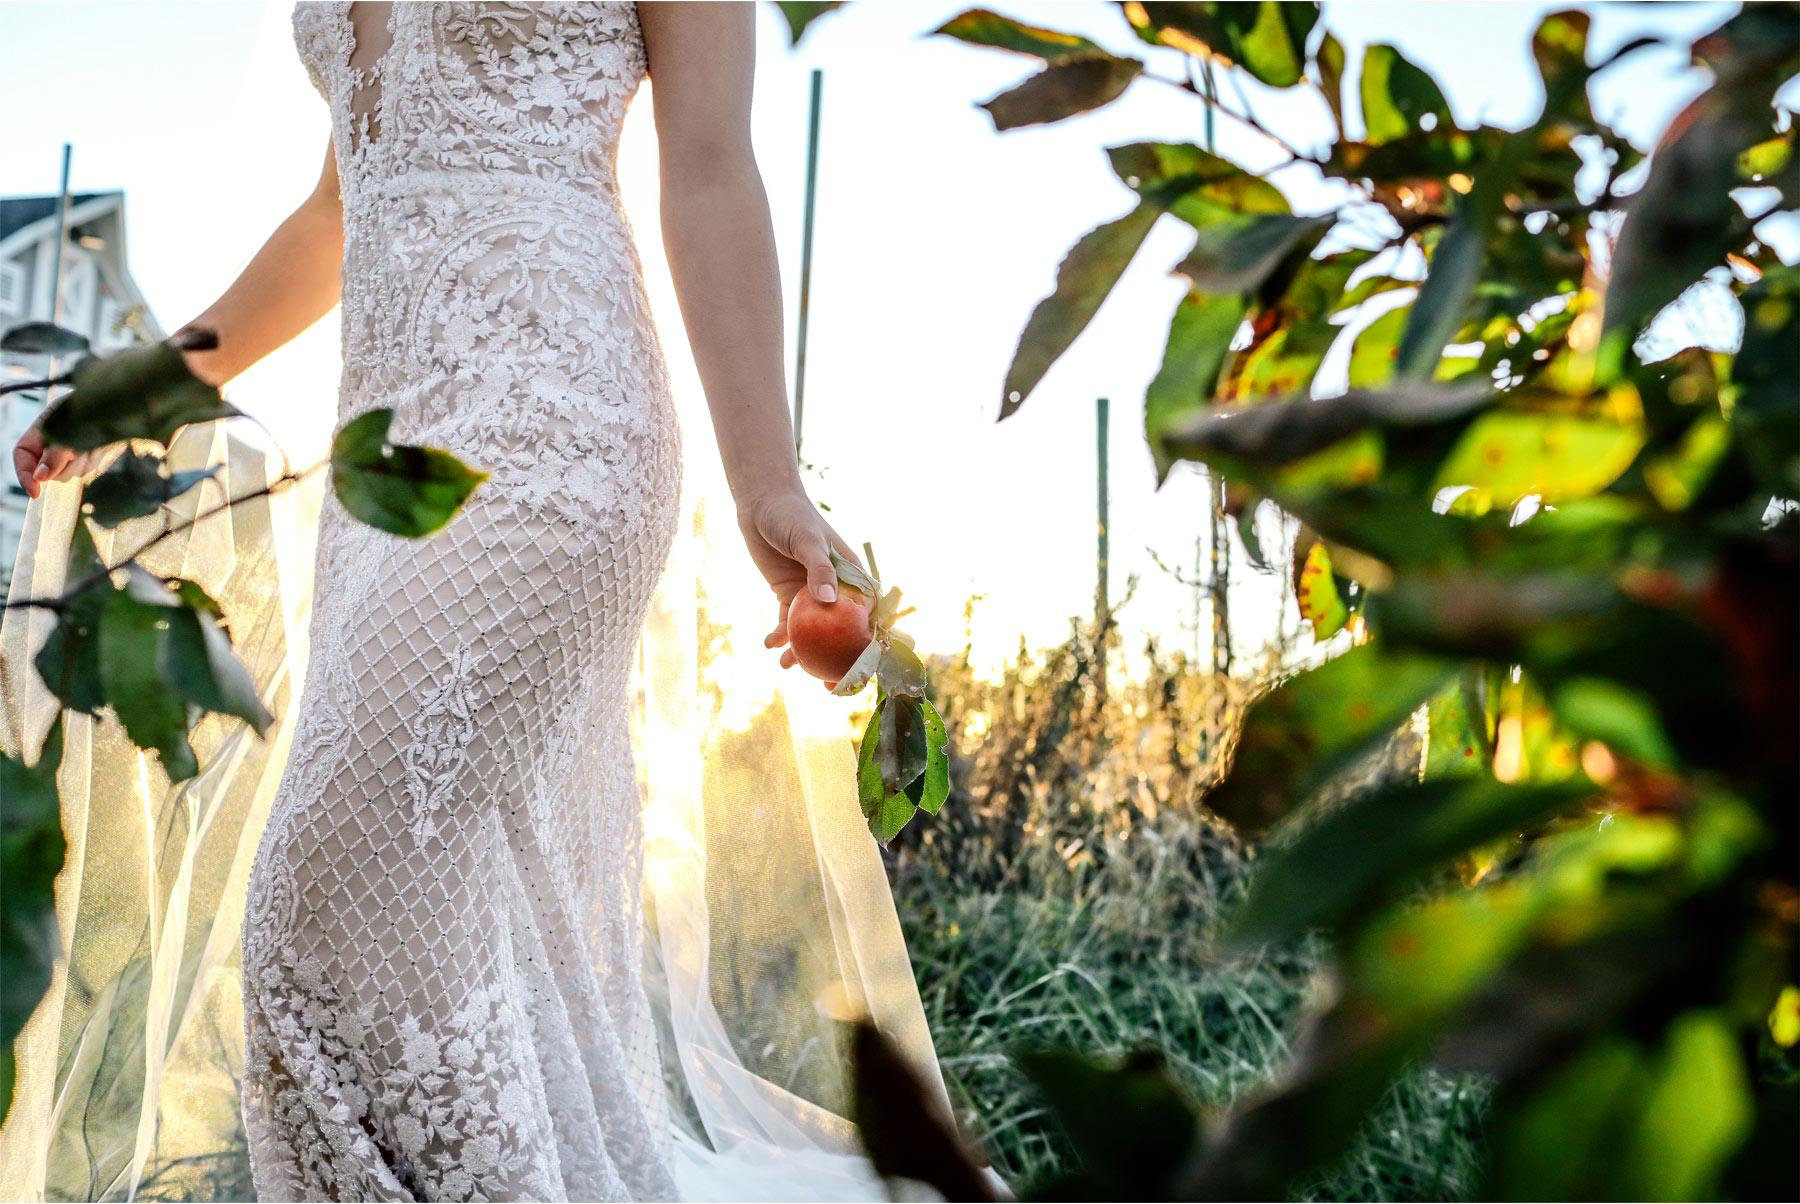 15-Ashery-Lane-Farm-Minneapolis-Minnesota-Wedding-Styled-Shoot-New-Venue-Barn-Orchard-Vineyard-Apple.jpg